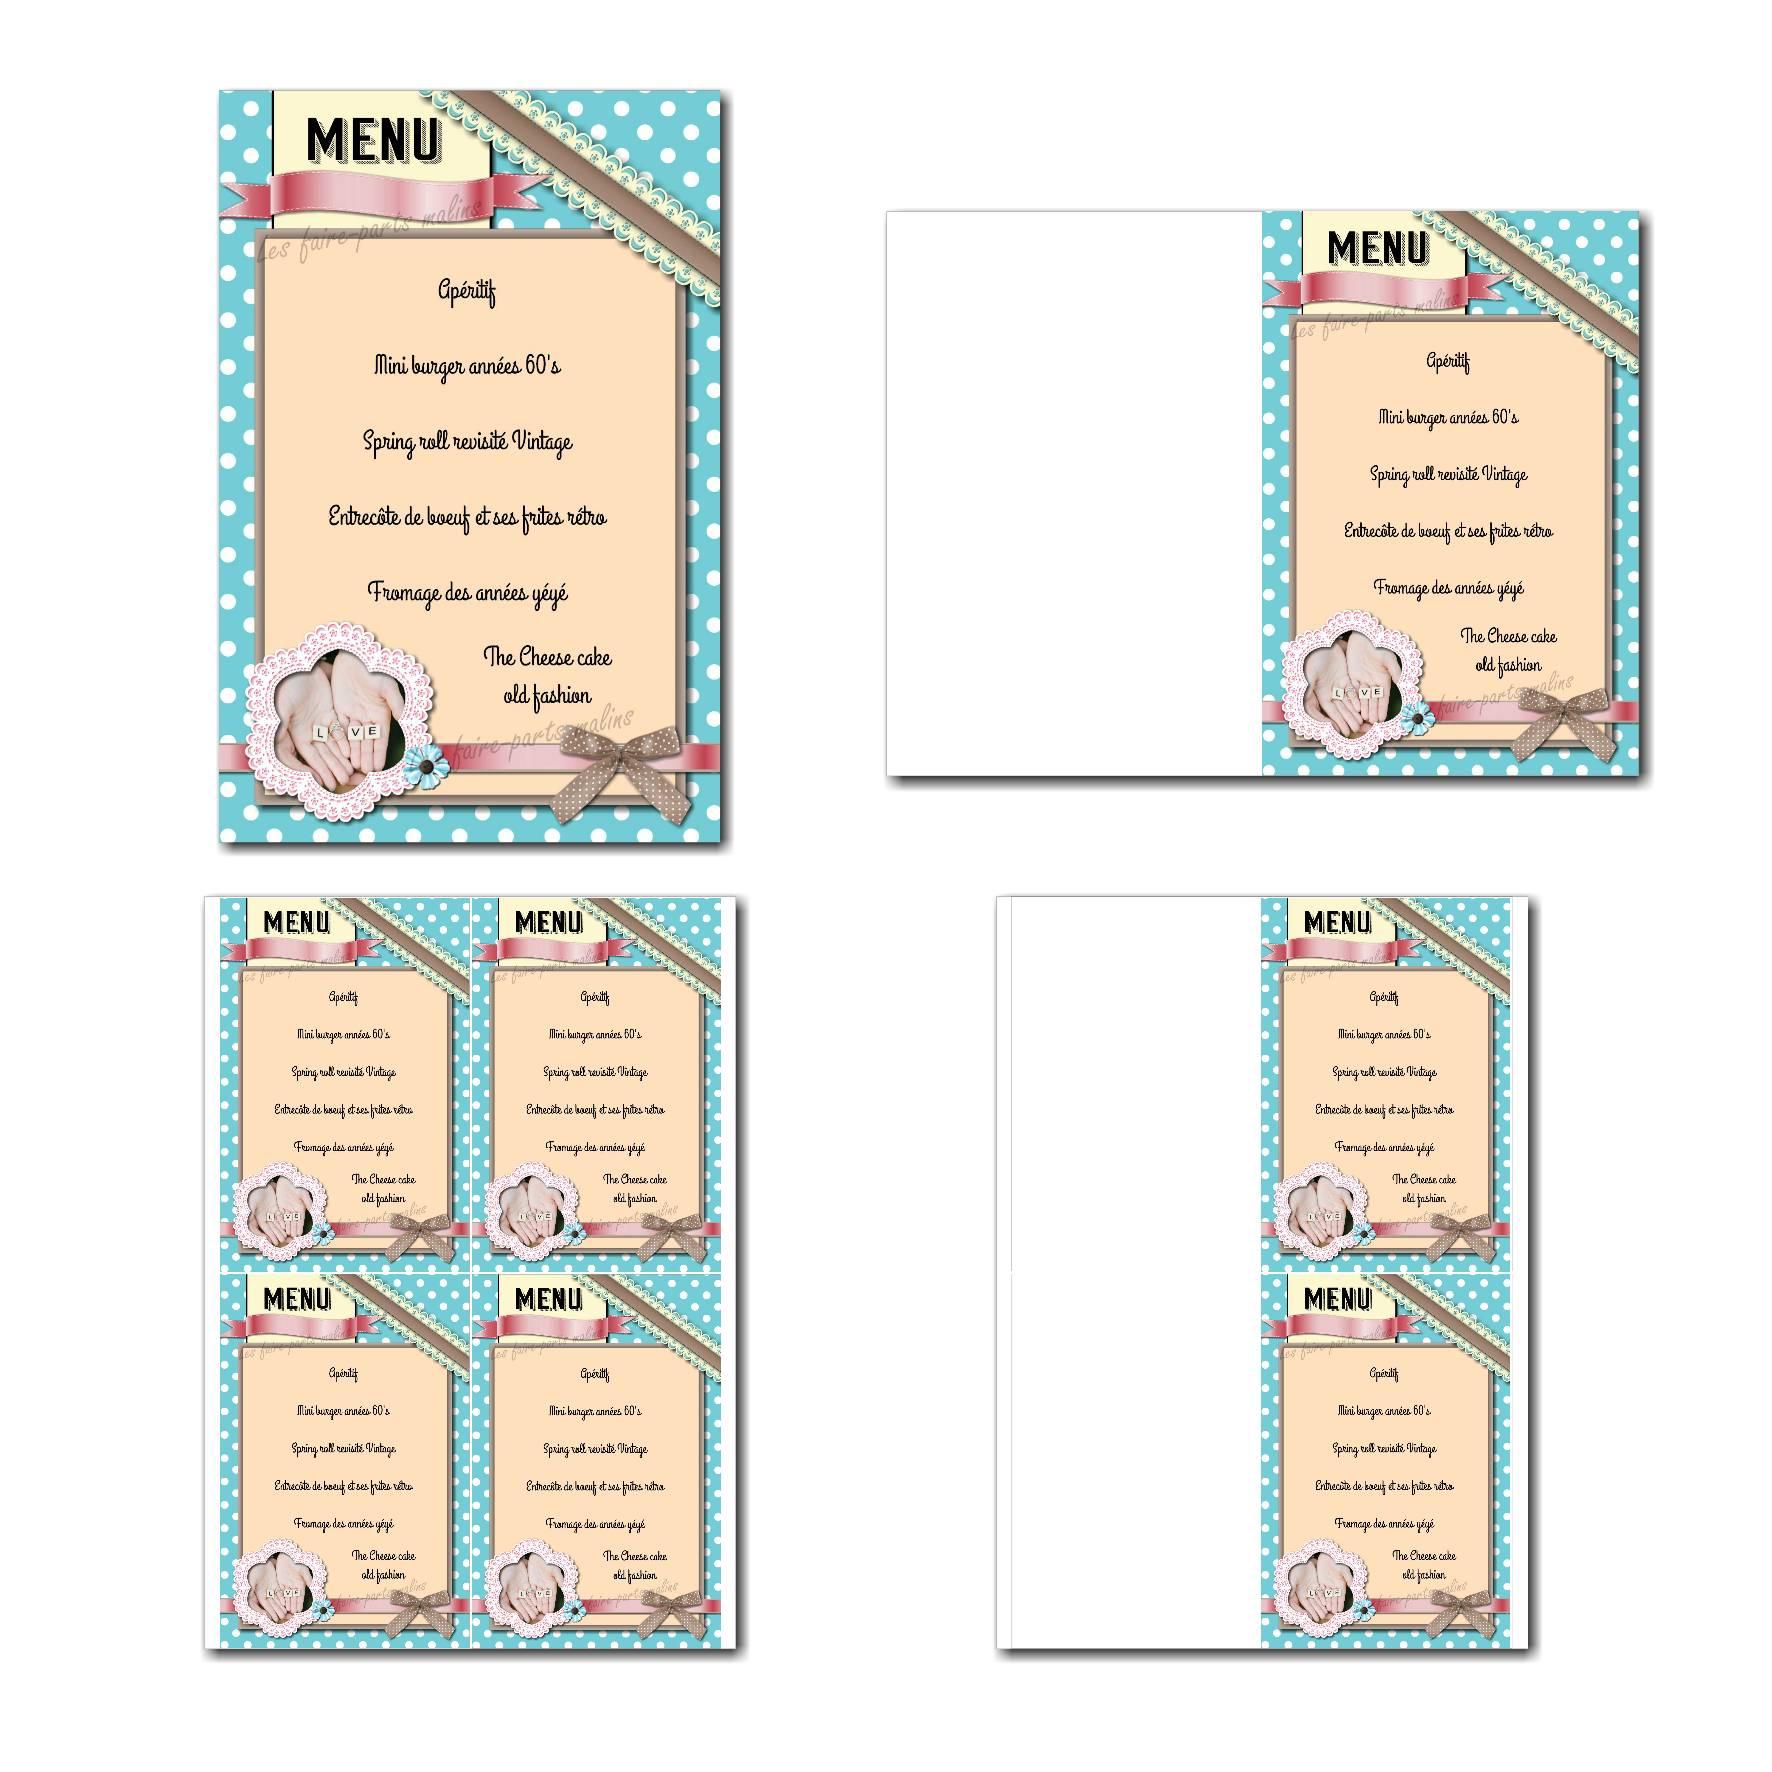 Pai 55 mariage menu 10x15